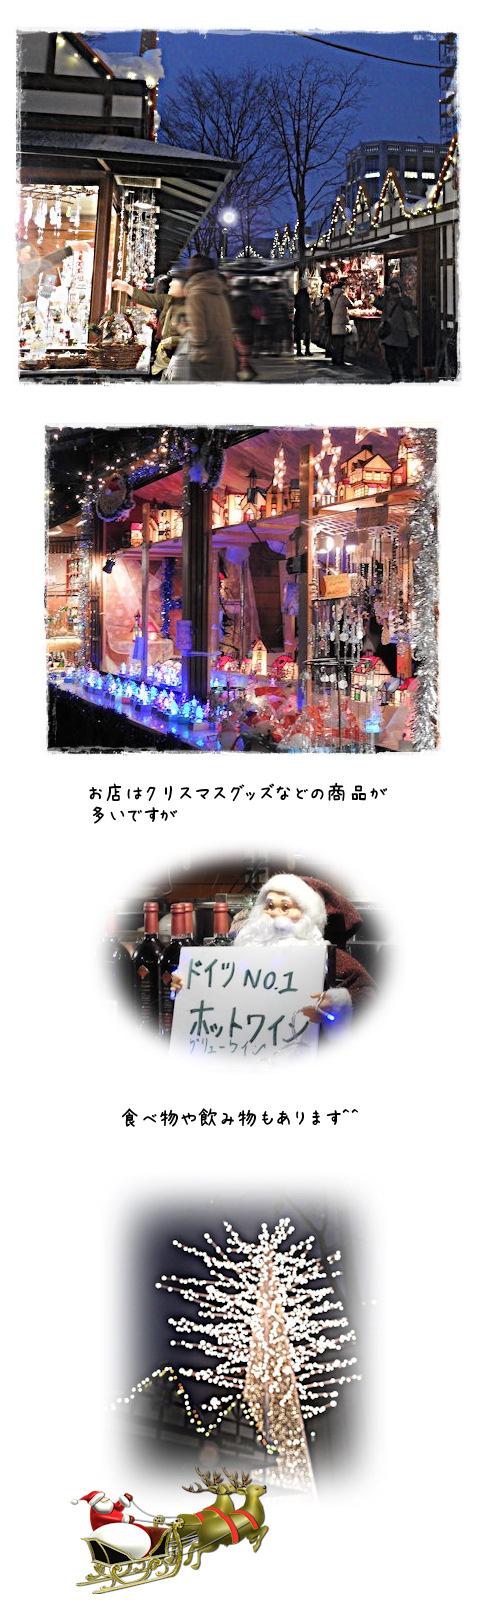 20151221christmas2.jpg